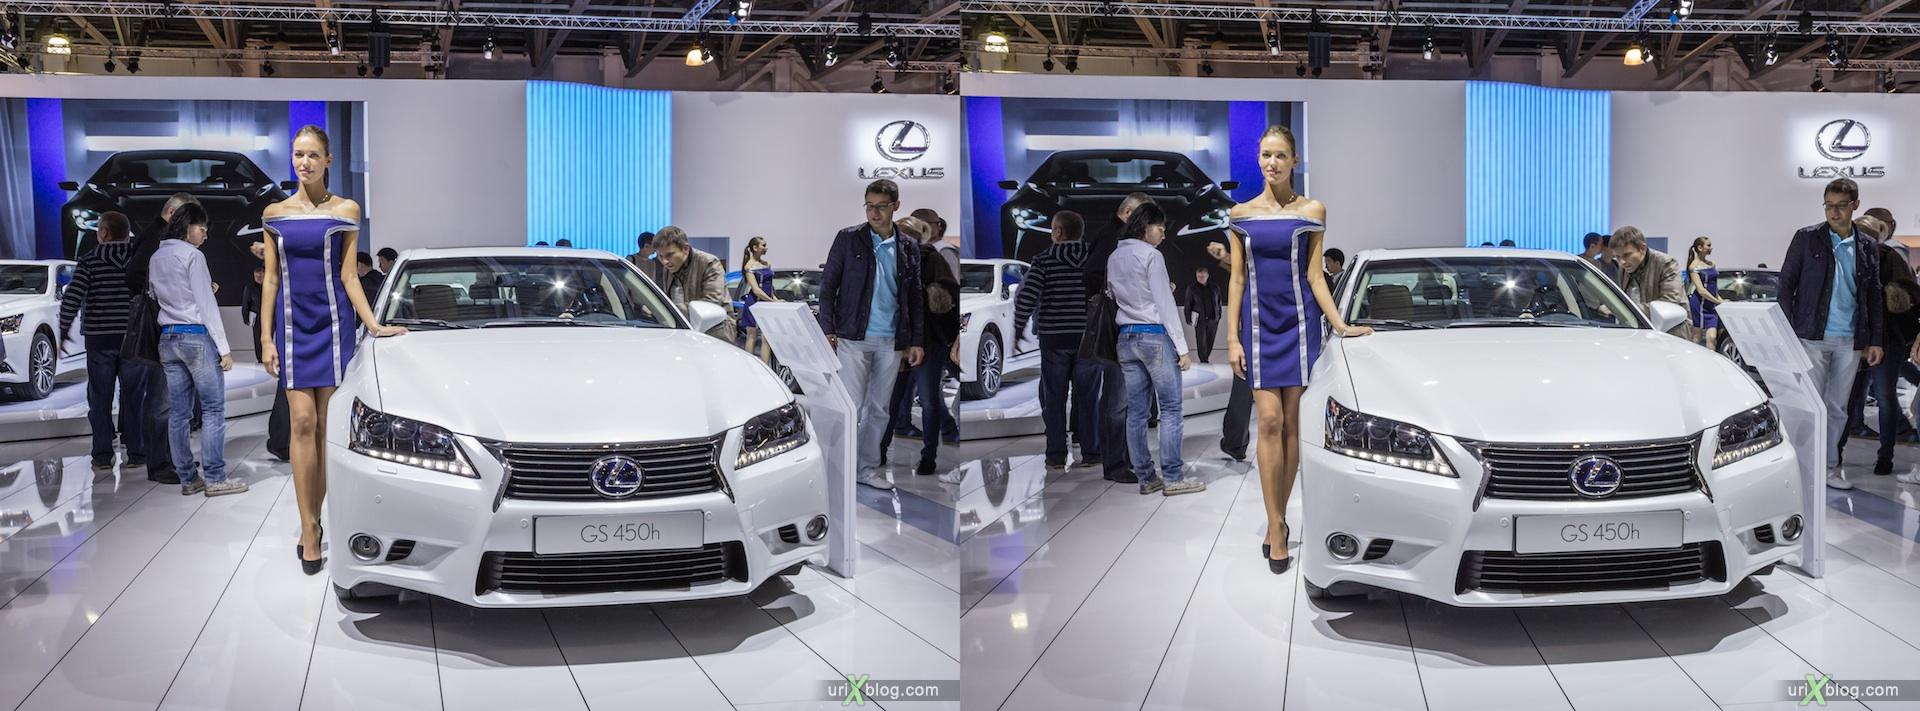 2012, Lexus GS 450h, девушка, модель, girl, model, Moscow International Automobile Salon, auto show, 3D, stereo pair, cross-eyed, crossview